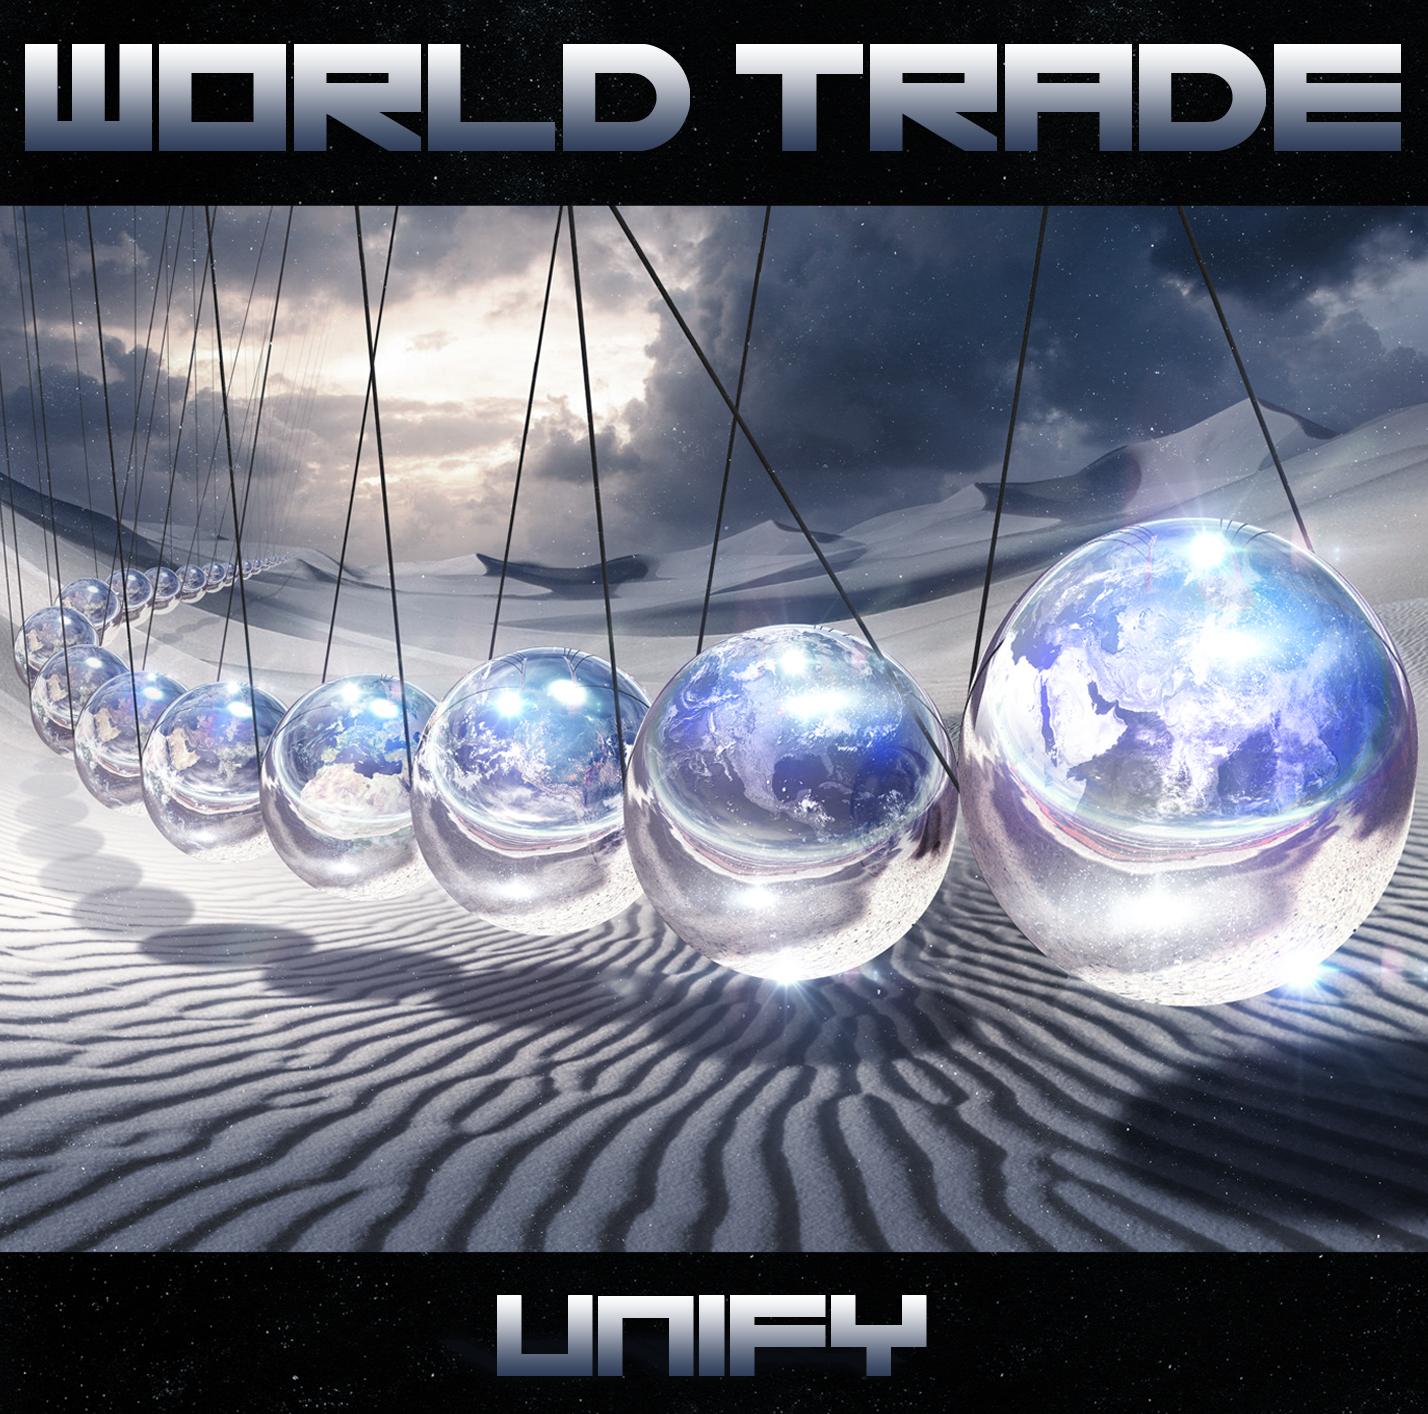 WORLD_TRADE_unify_COVER_HI